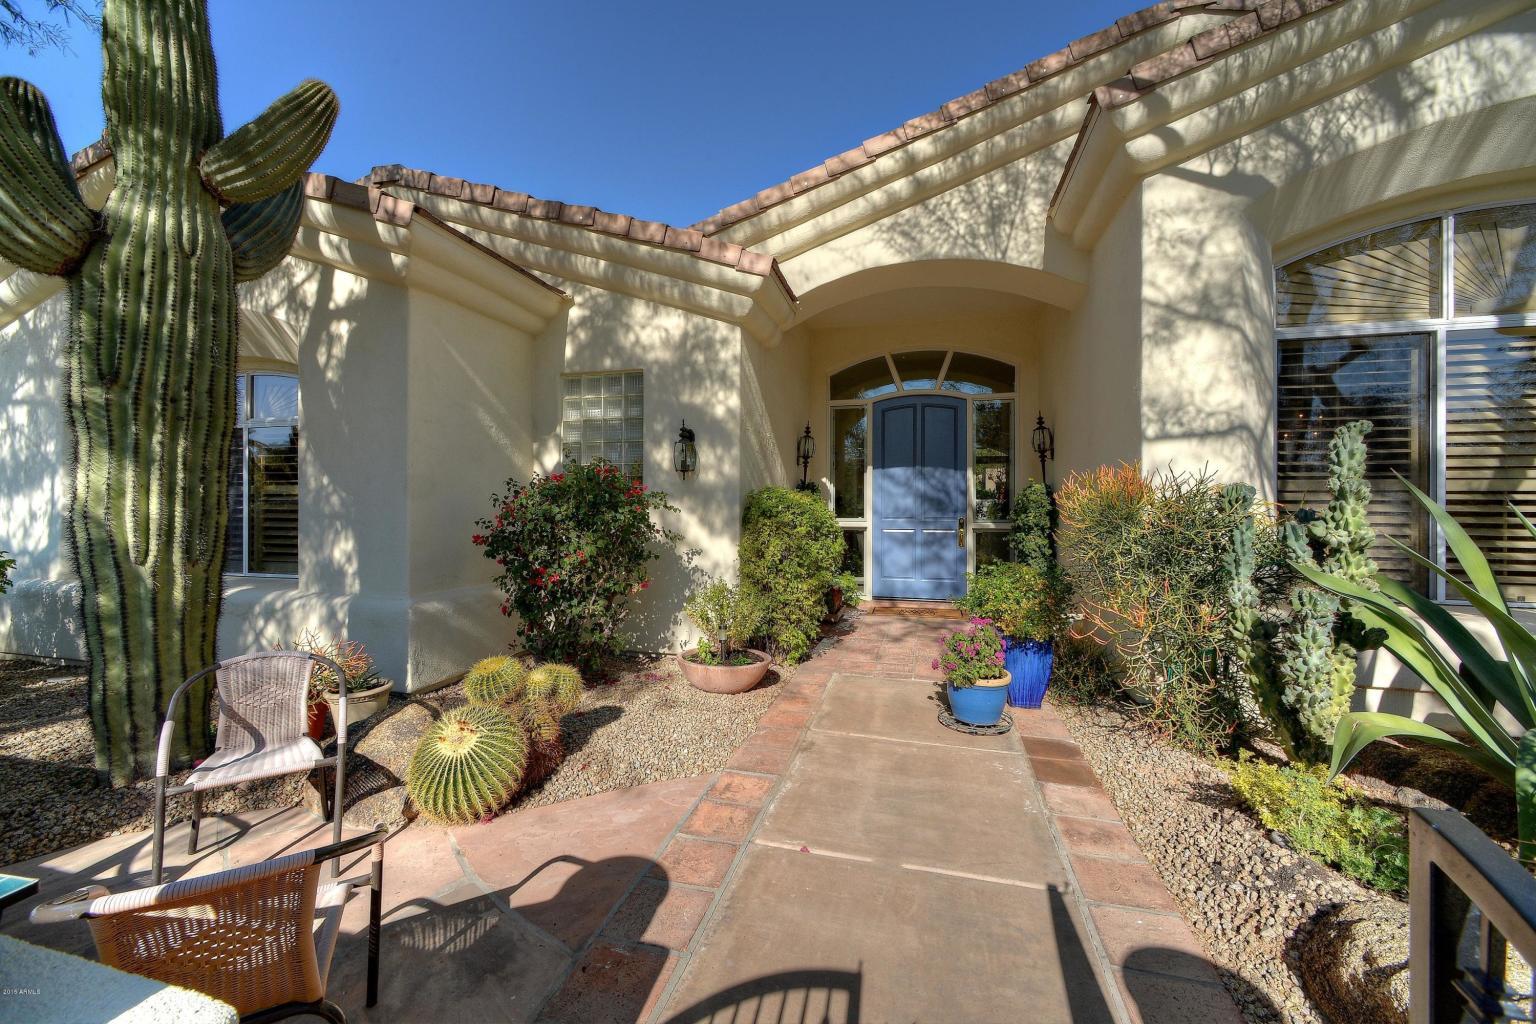 7170 E Paradise Canyon Rd, Paradise Valley | $1,000,000